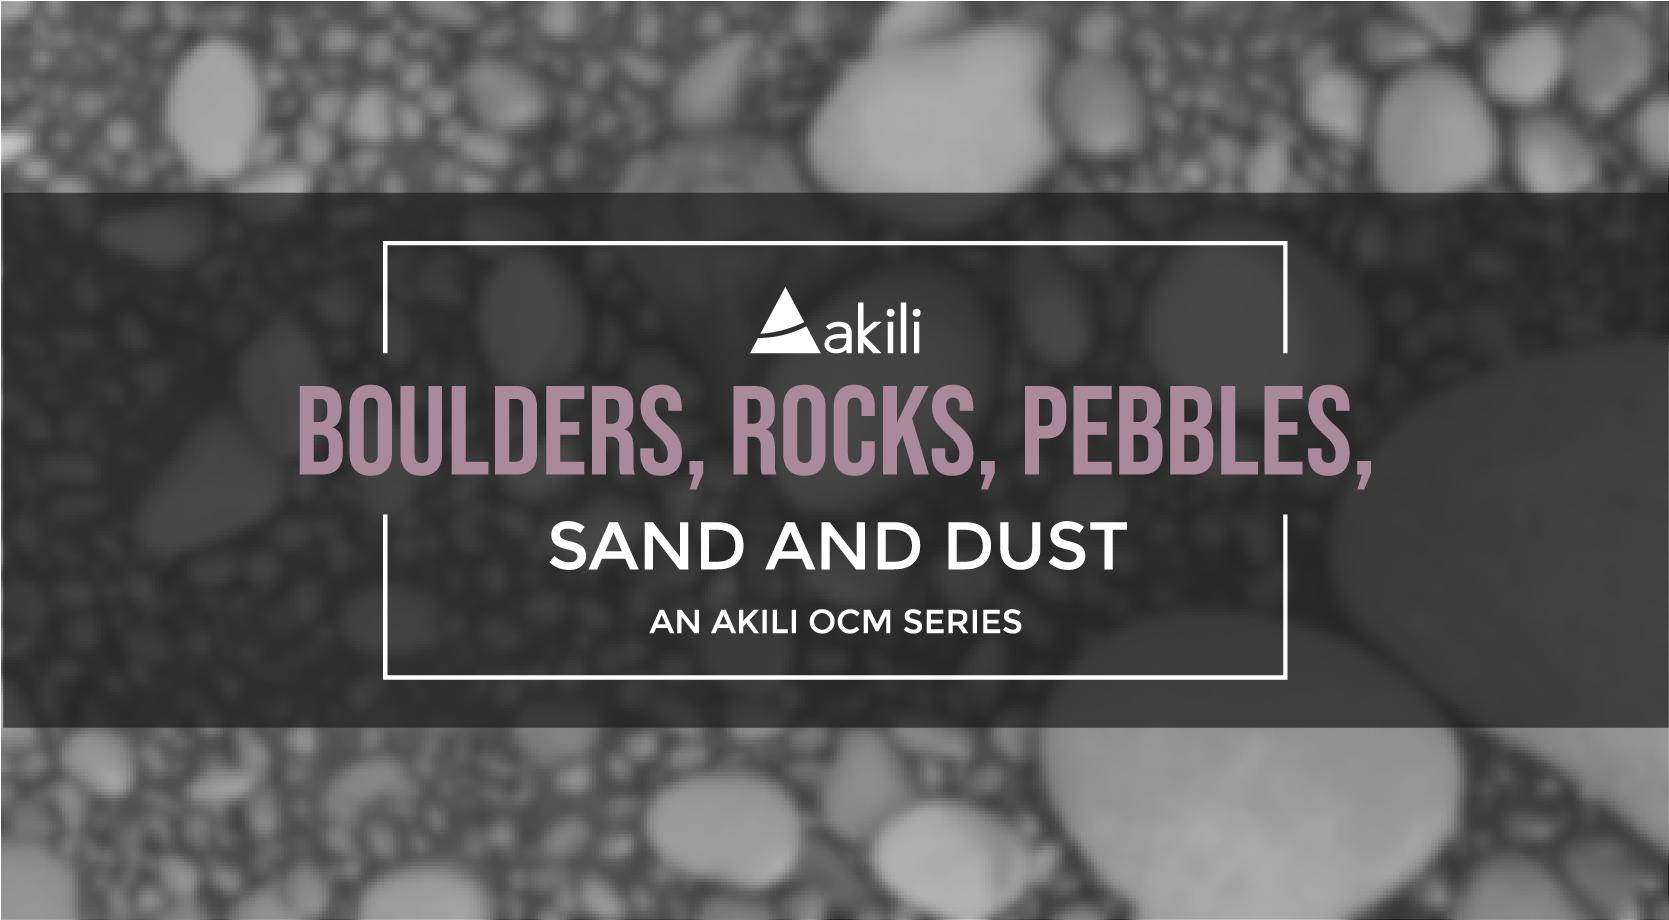 Boulders, Rocks, Pebbles, Sand and Dust